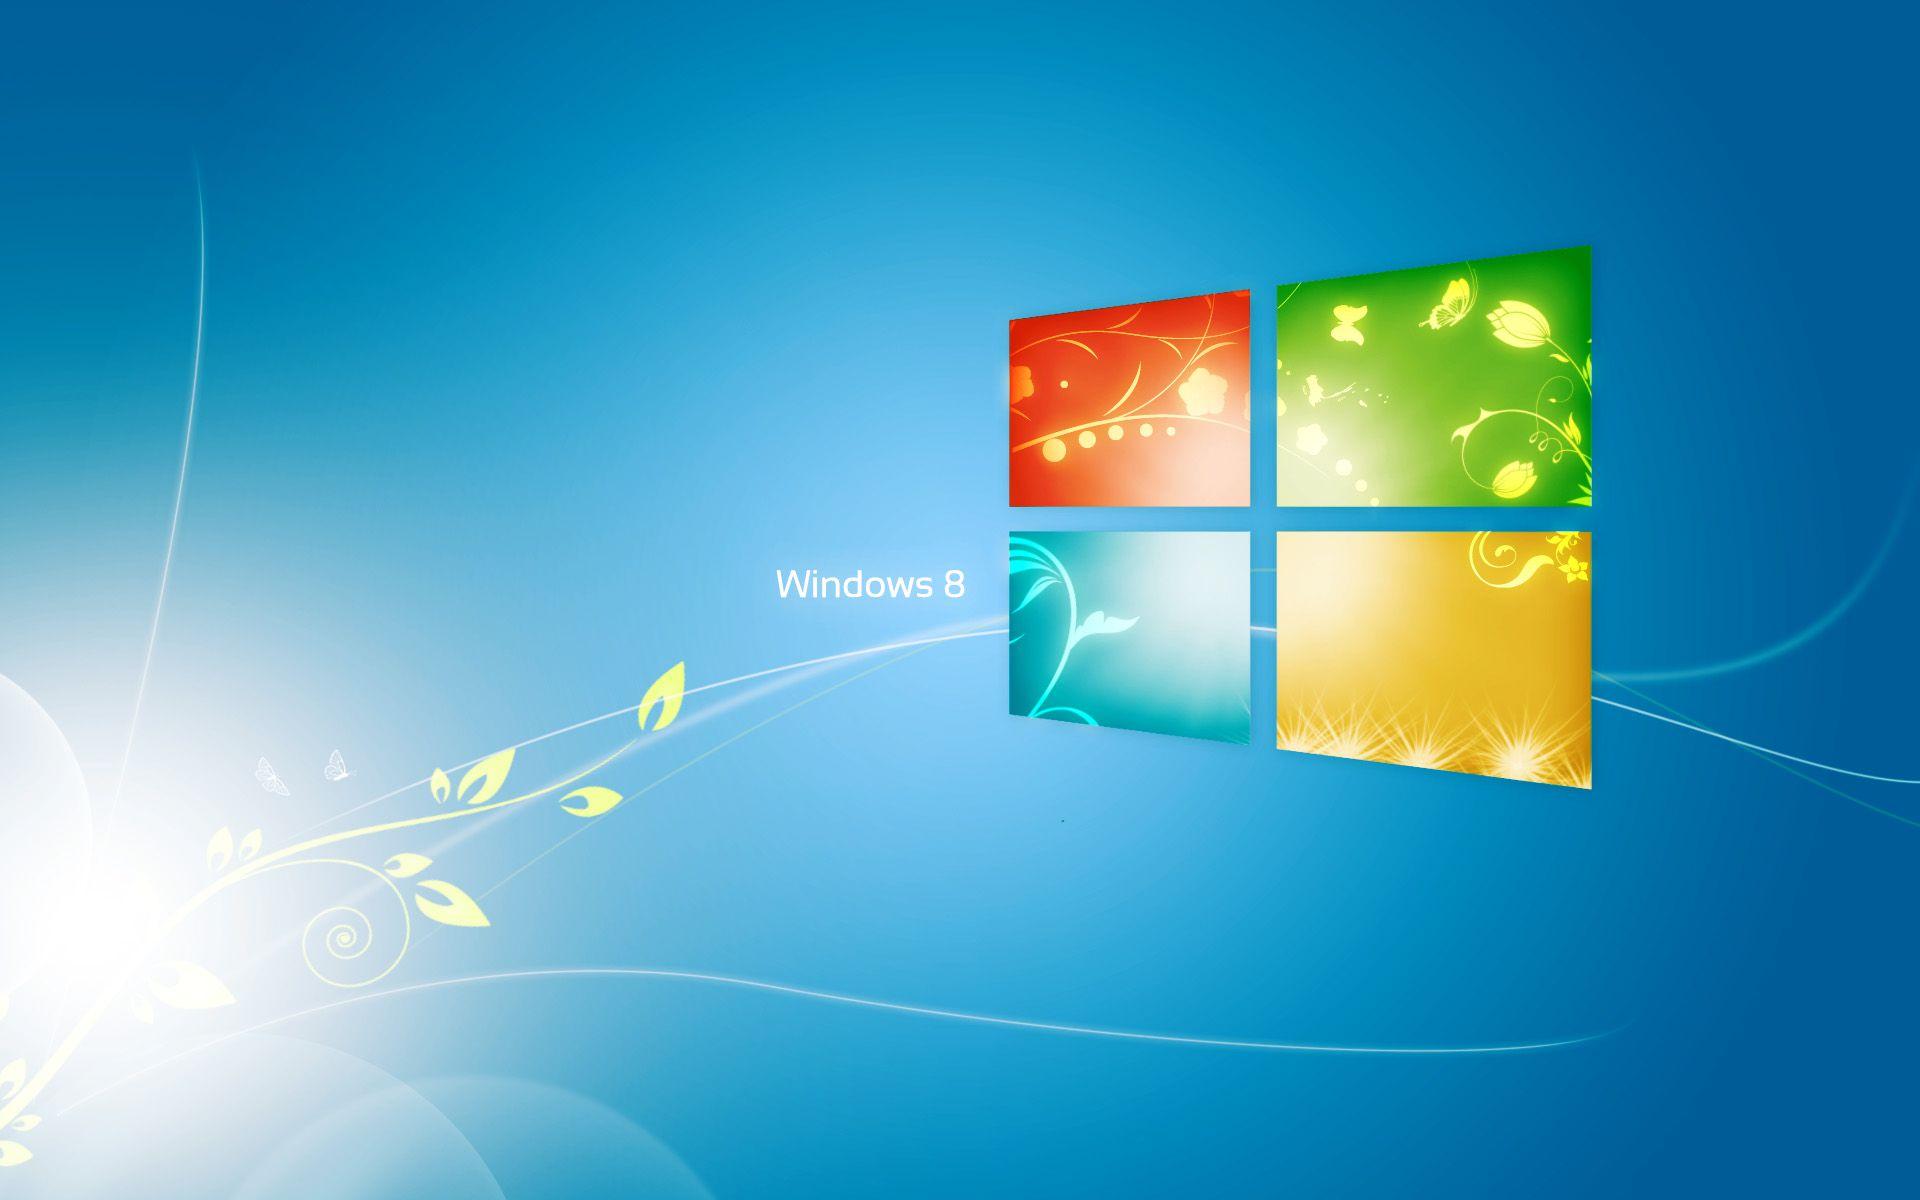 Windows 8 Wallpapers Windows Computadoras Smartphone